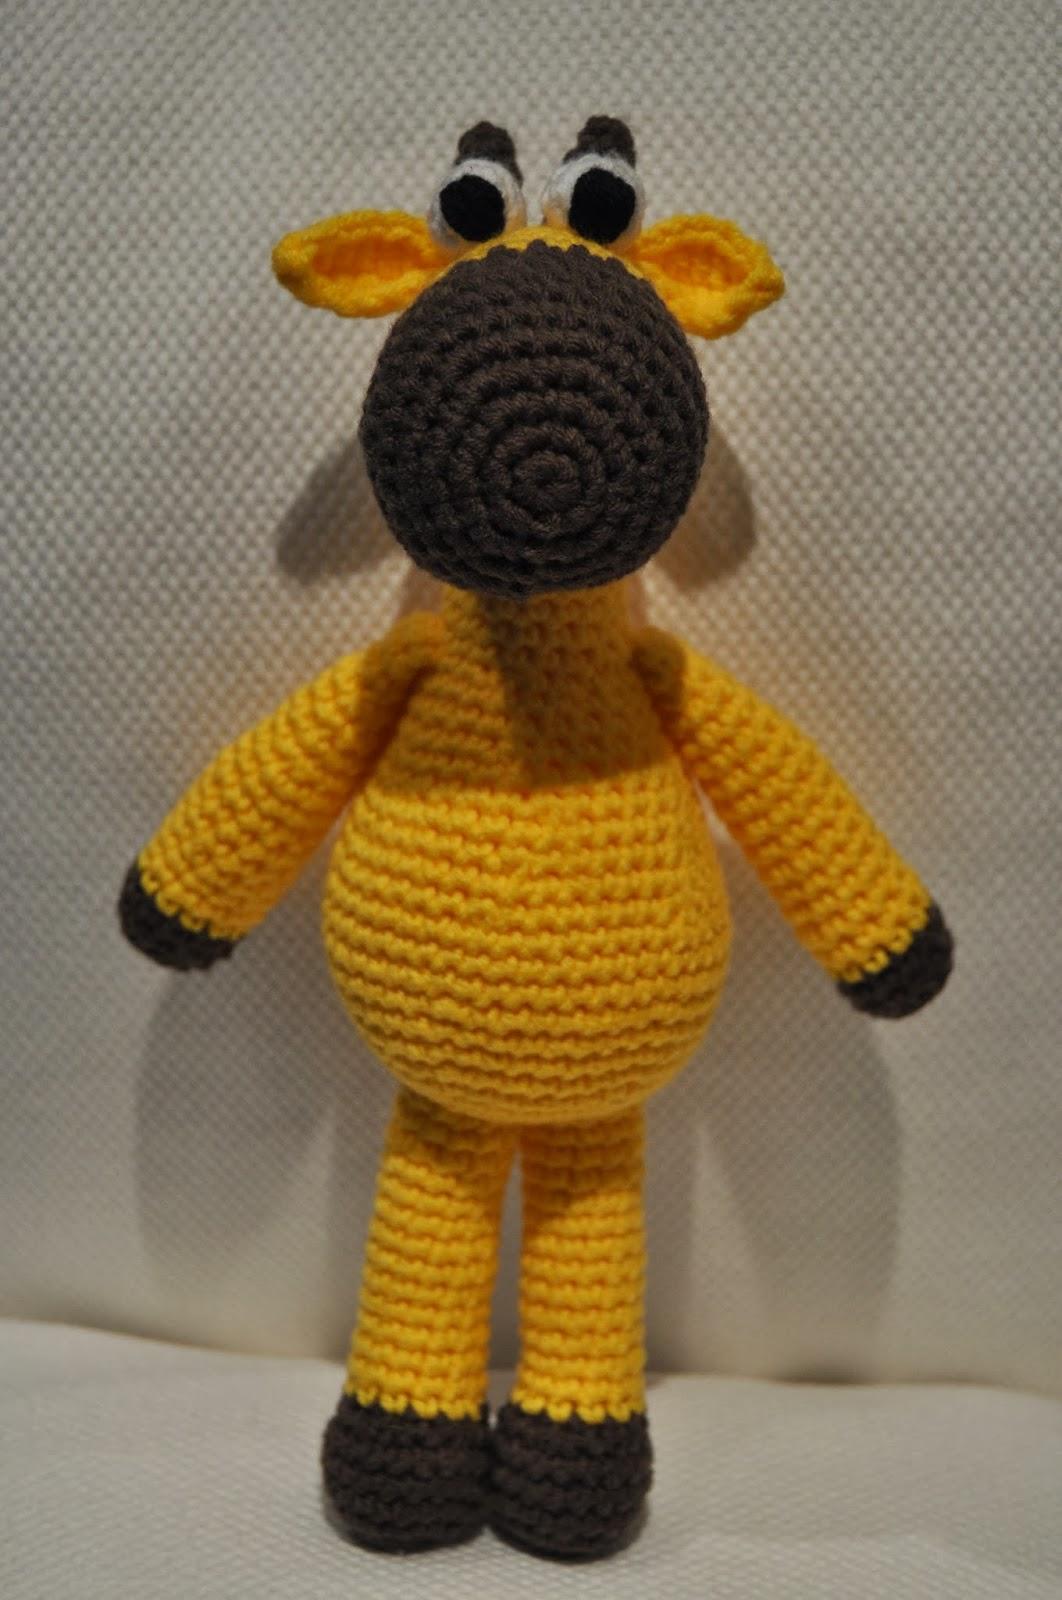 Jirafa Amigurumi Patron gratis!   Crochet baby, Knitted toys ...   1600x1062